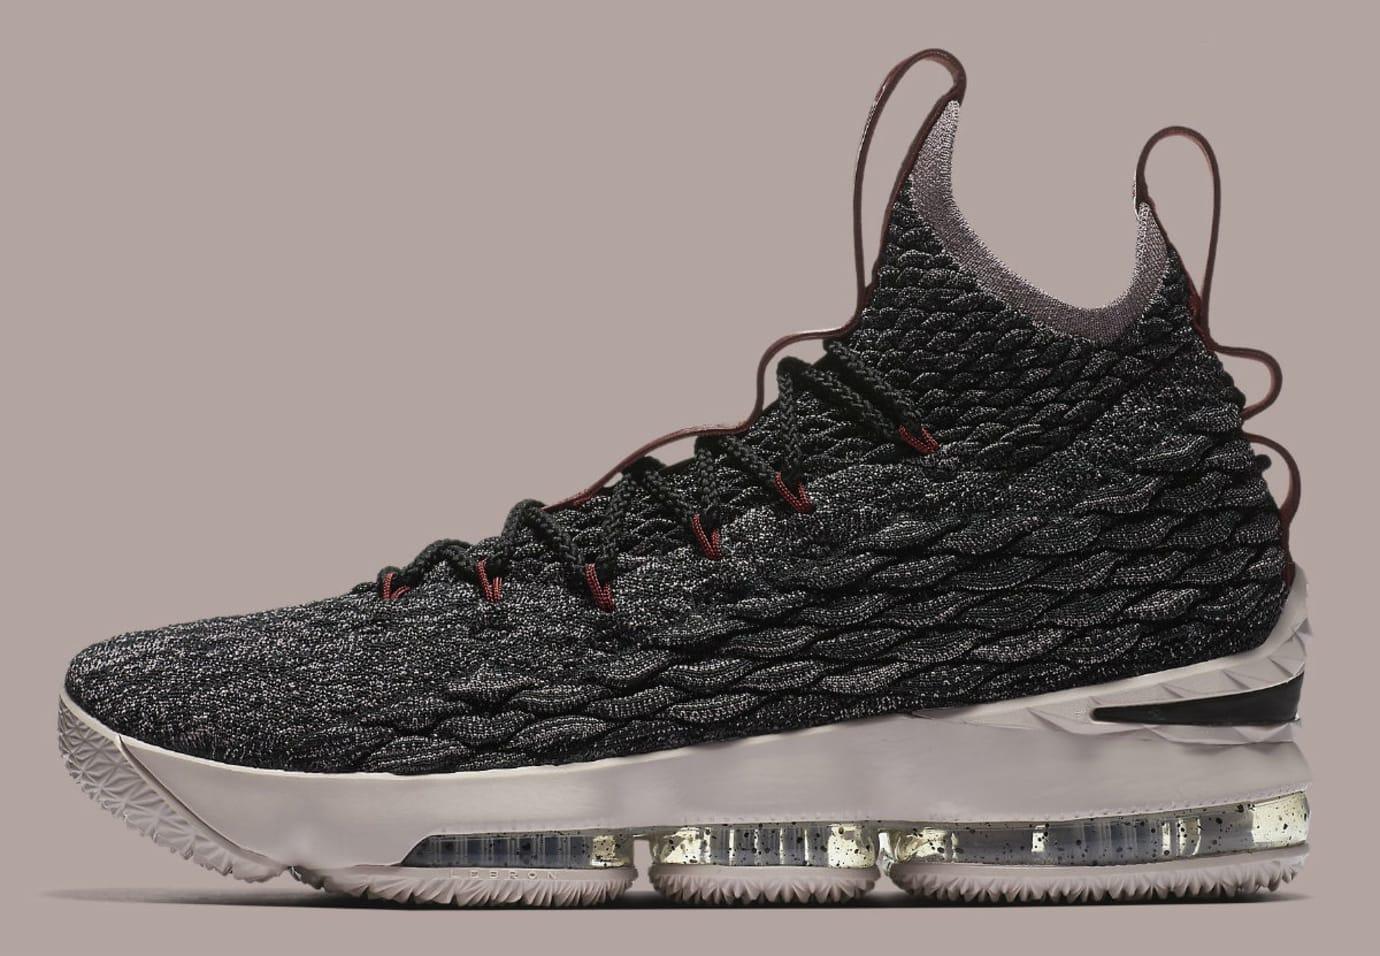 reputable site 2edfe e50ad Nike LeBron 15 Pride of Ohio Release Date 897648-003 | Sole ...